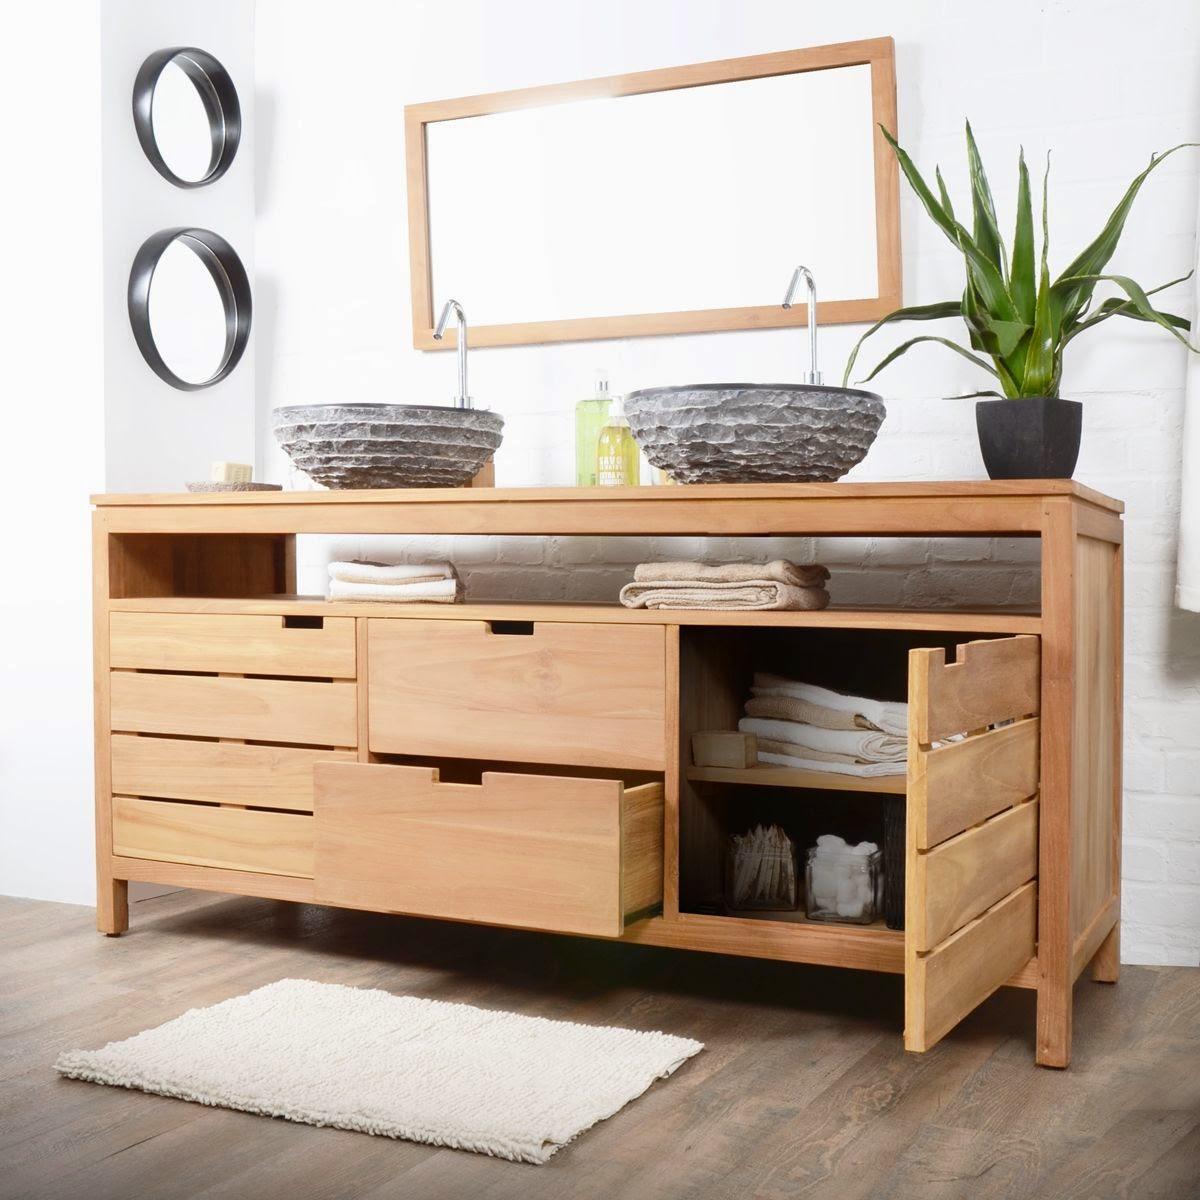 meuble salle bain bois. Black Bedroom Furniture Sets. Home Design Ideas